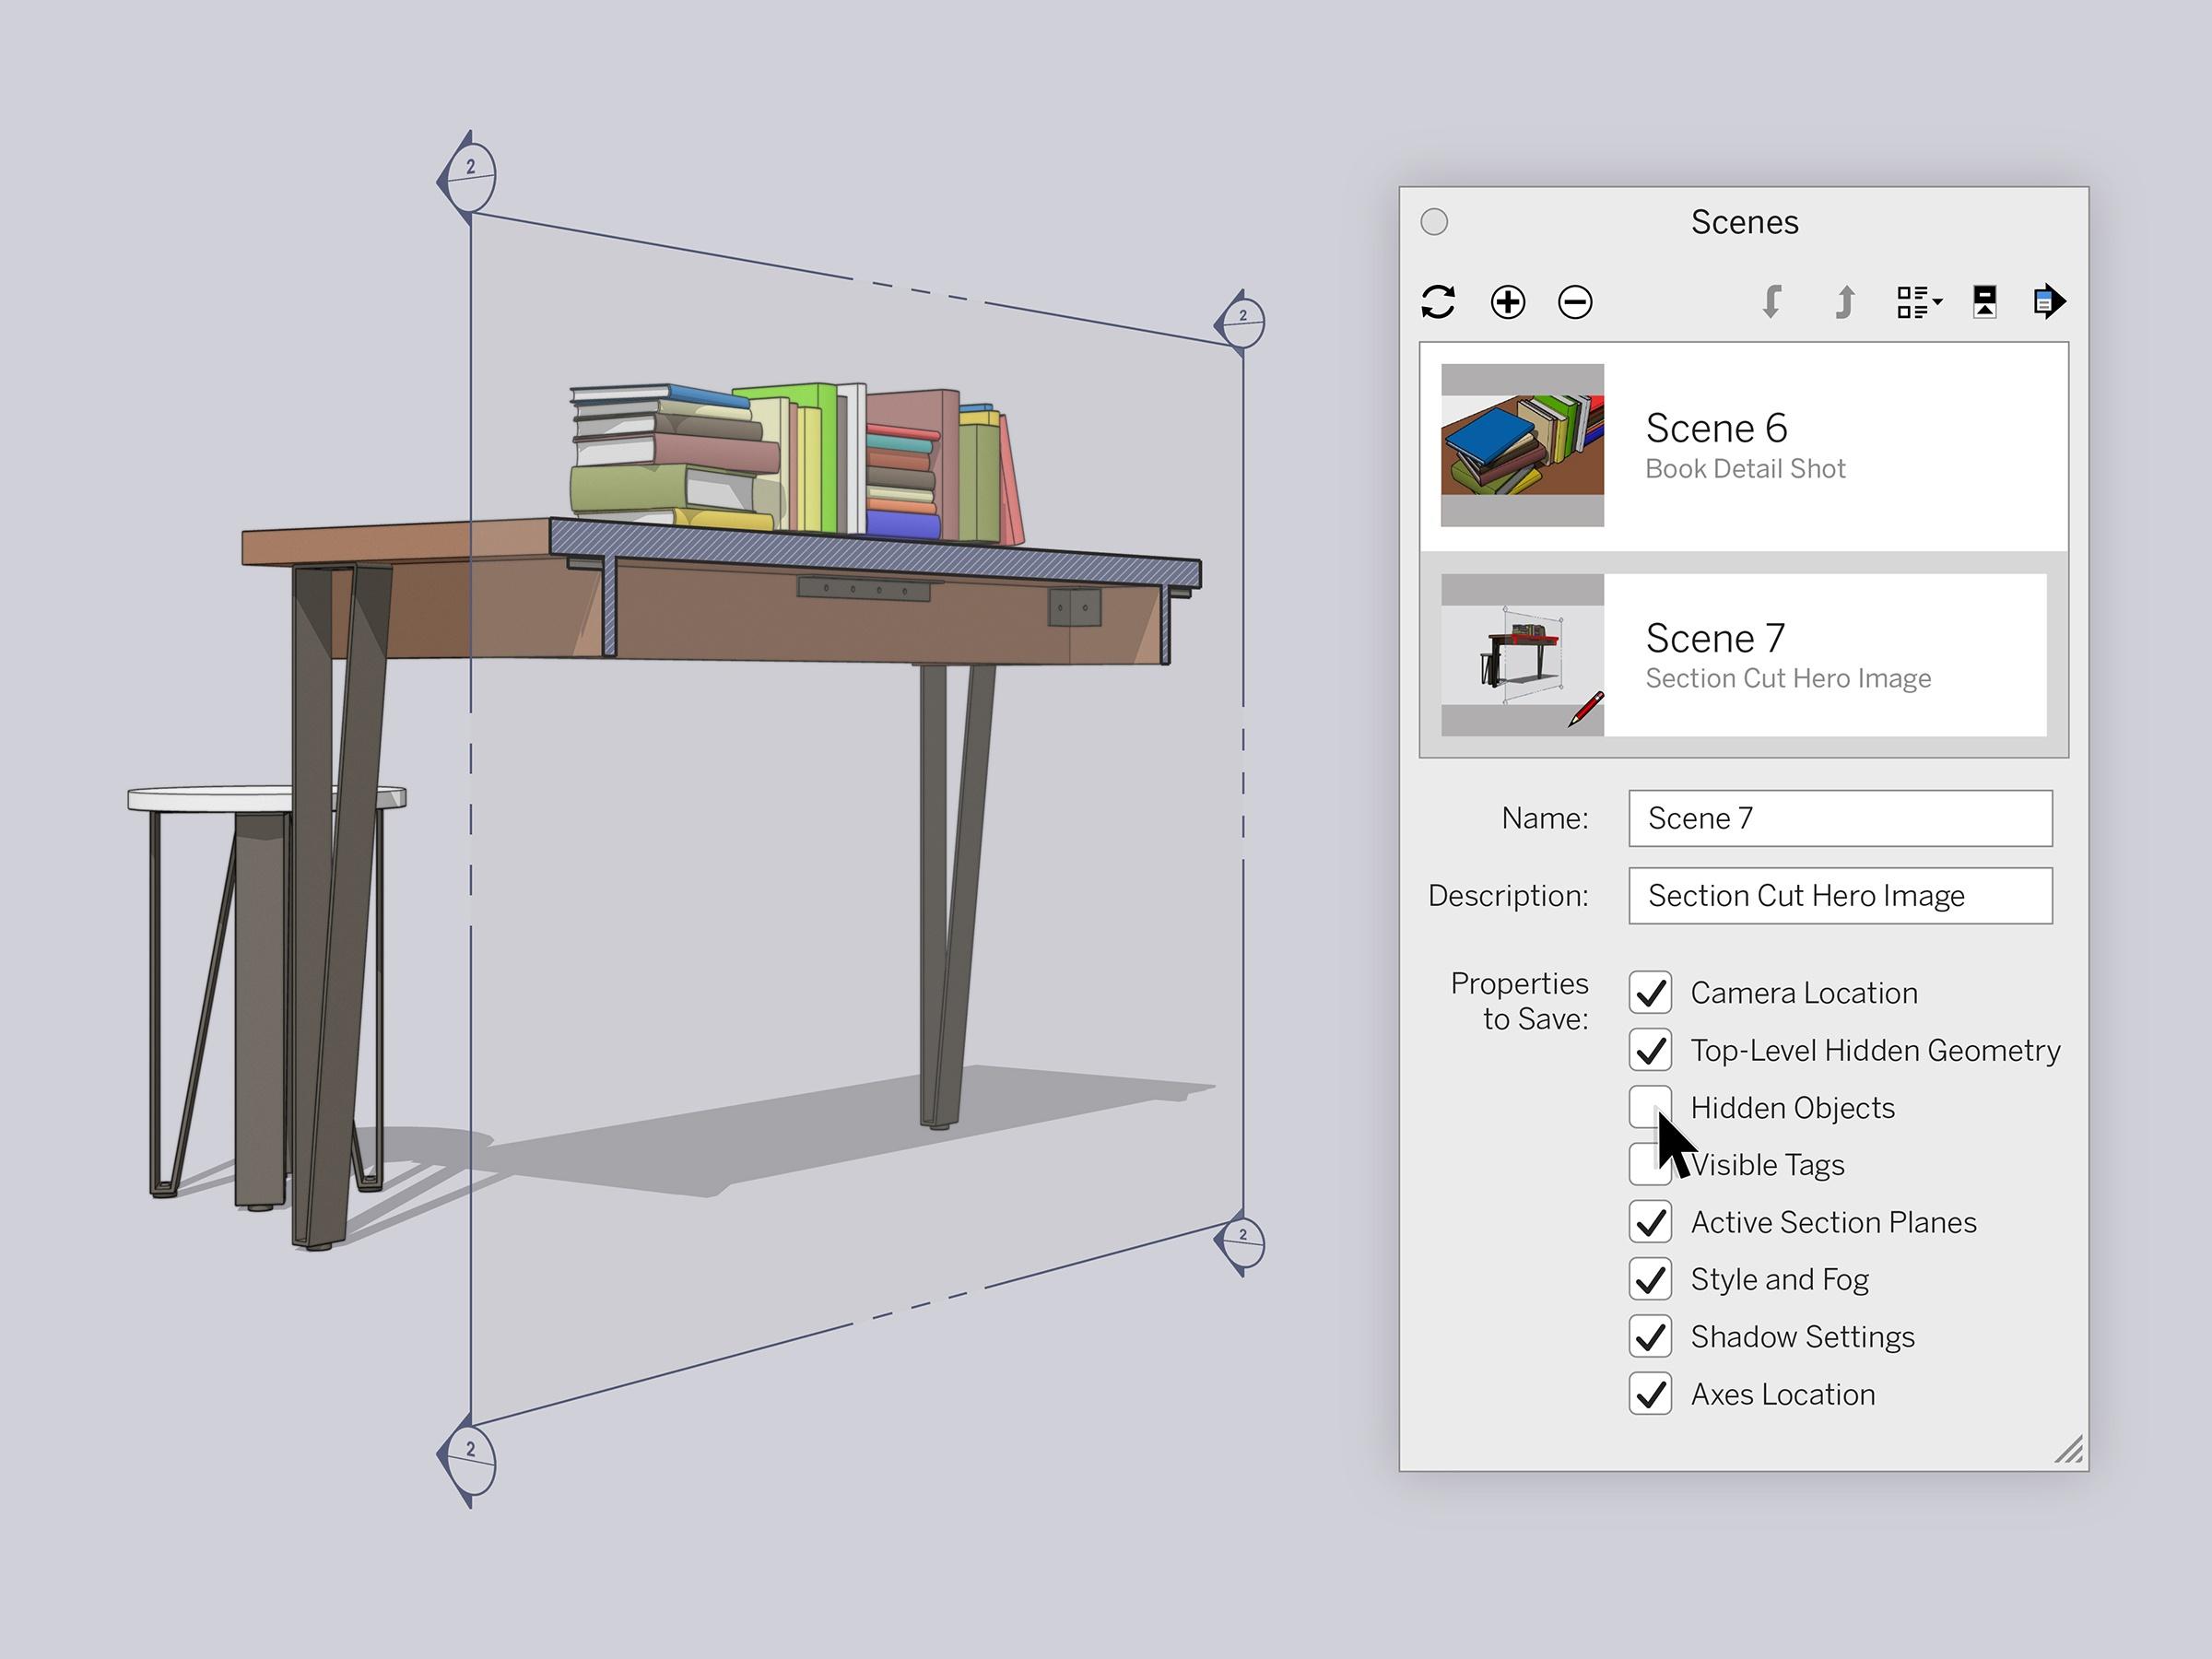 [ SKETCHUP généralité ] MAJ Sketchup 2020 Version 20.1 AHViPTEwMjA5MSZjbWQ9aXRlbWVkaXRvcmltYWdlJmZpbGVuYW1lPWl0ZW1lZGl0b3JpbWFnZV81ZTk2MGVjNmQ1NTJhLmpwZyZ2ZXJzaW9uPTAwMDAmc2lnPWRmNjI4ZmEzMDg5MTE1MDg3MmRlZmQ0N2ViODBmMzQz